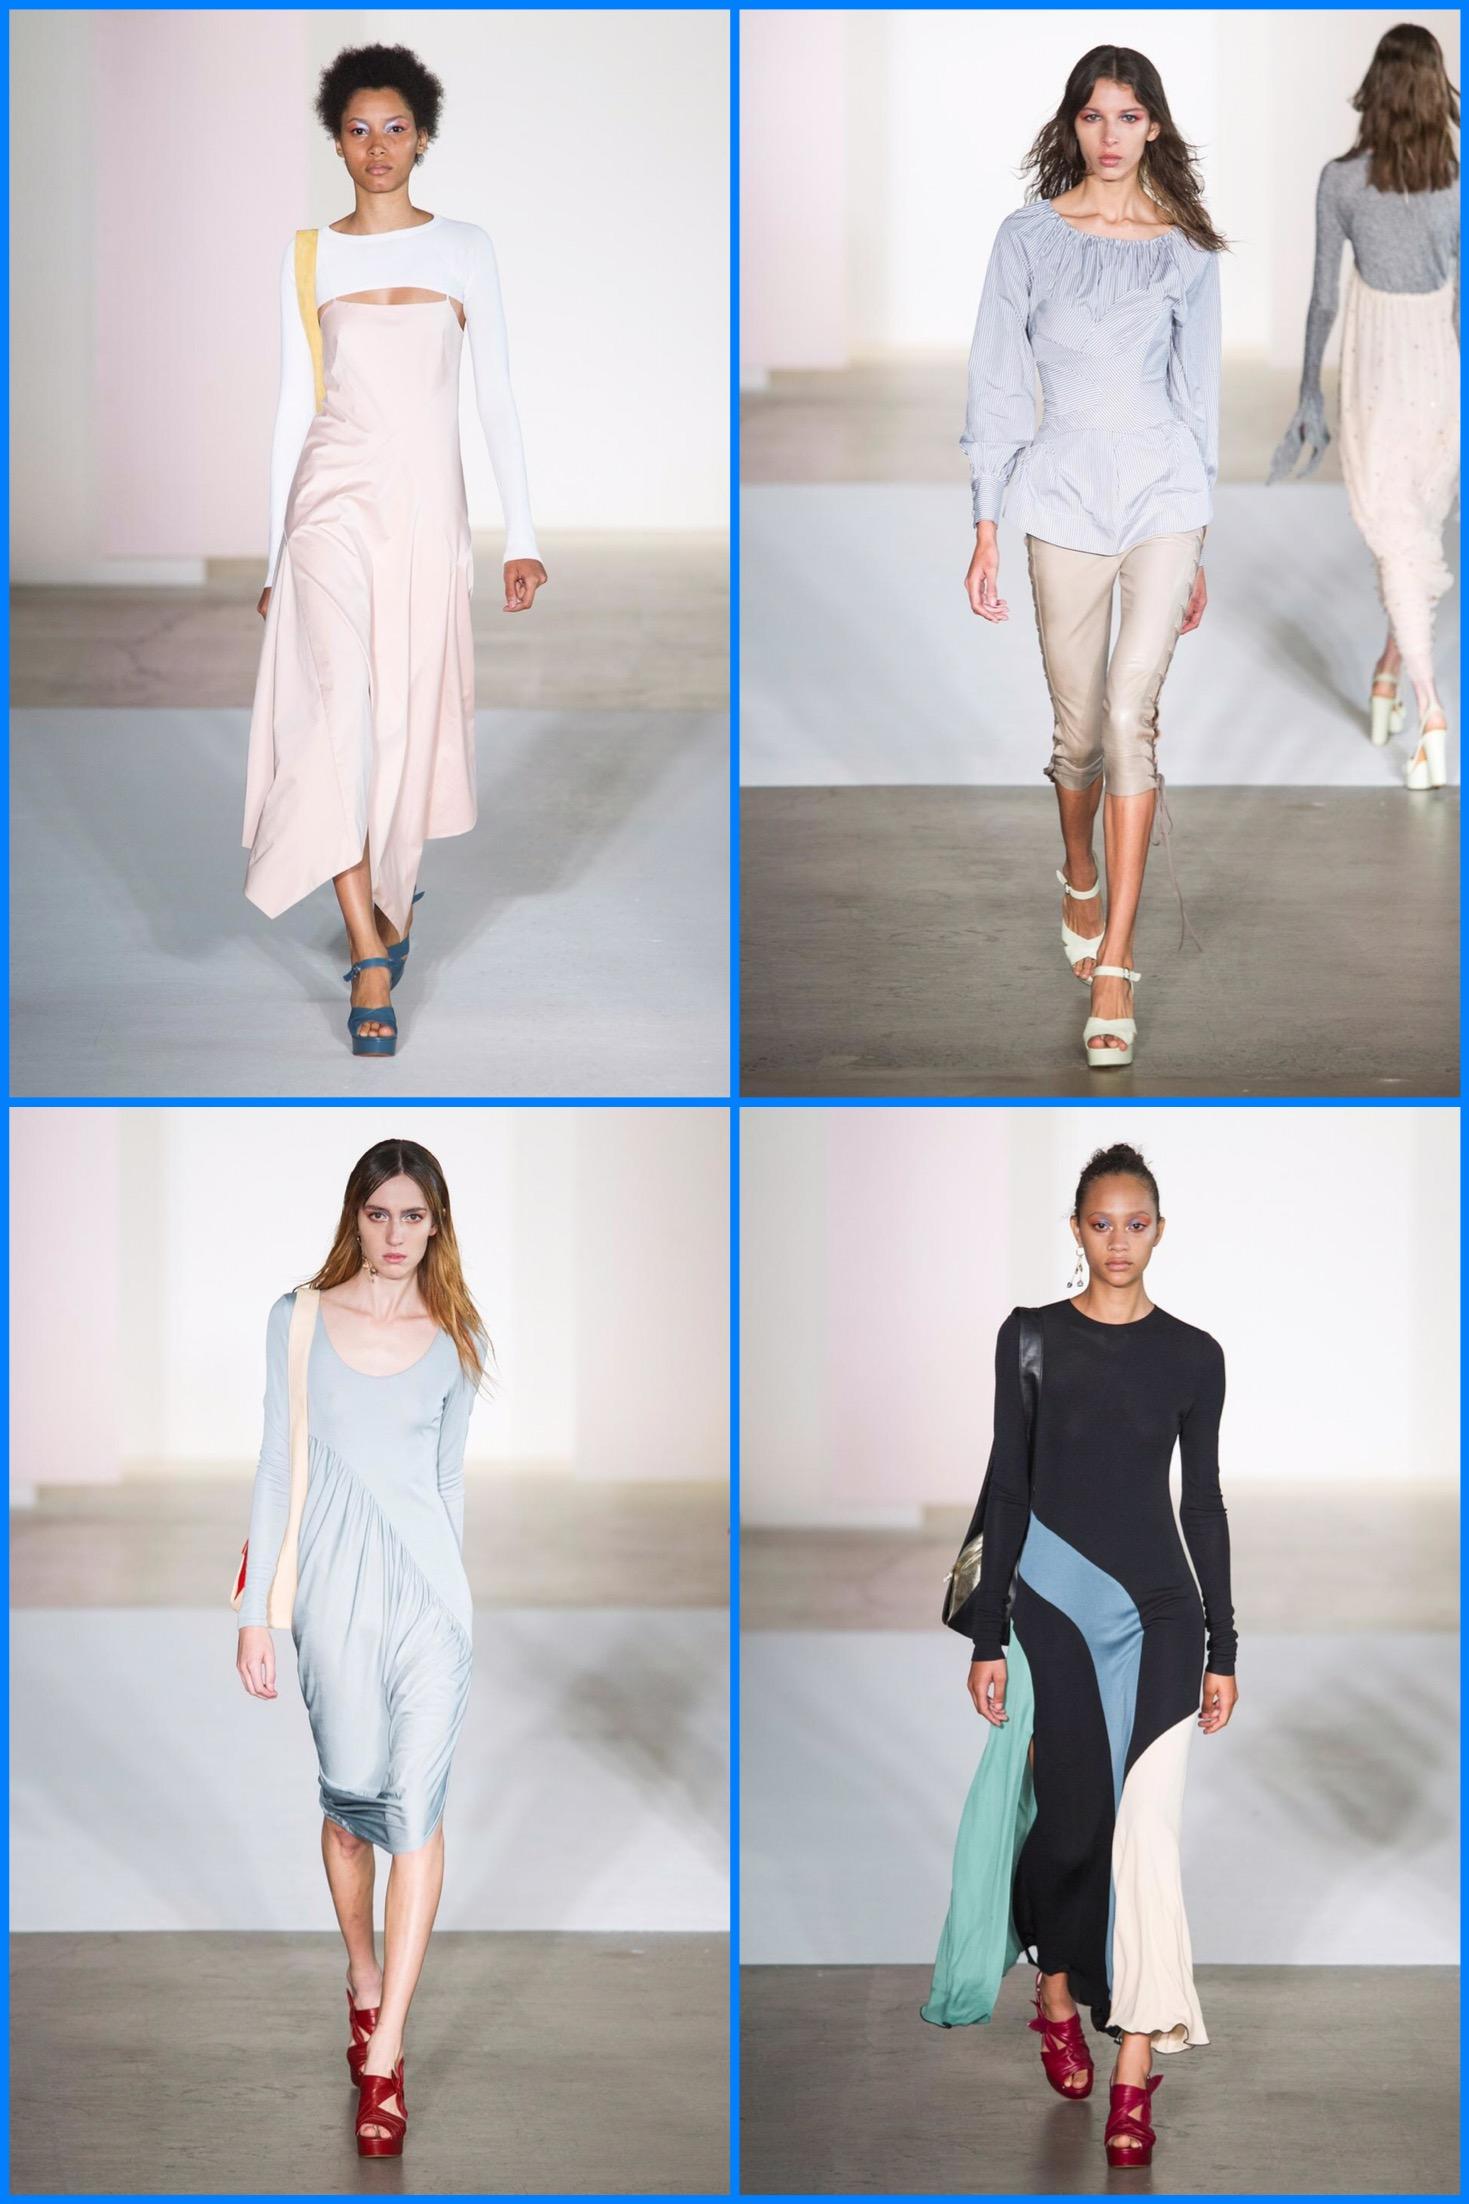 new-york-fashion-week-pret-a-porter-spring-summer-2017-style-jill-stuart